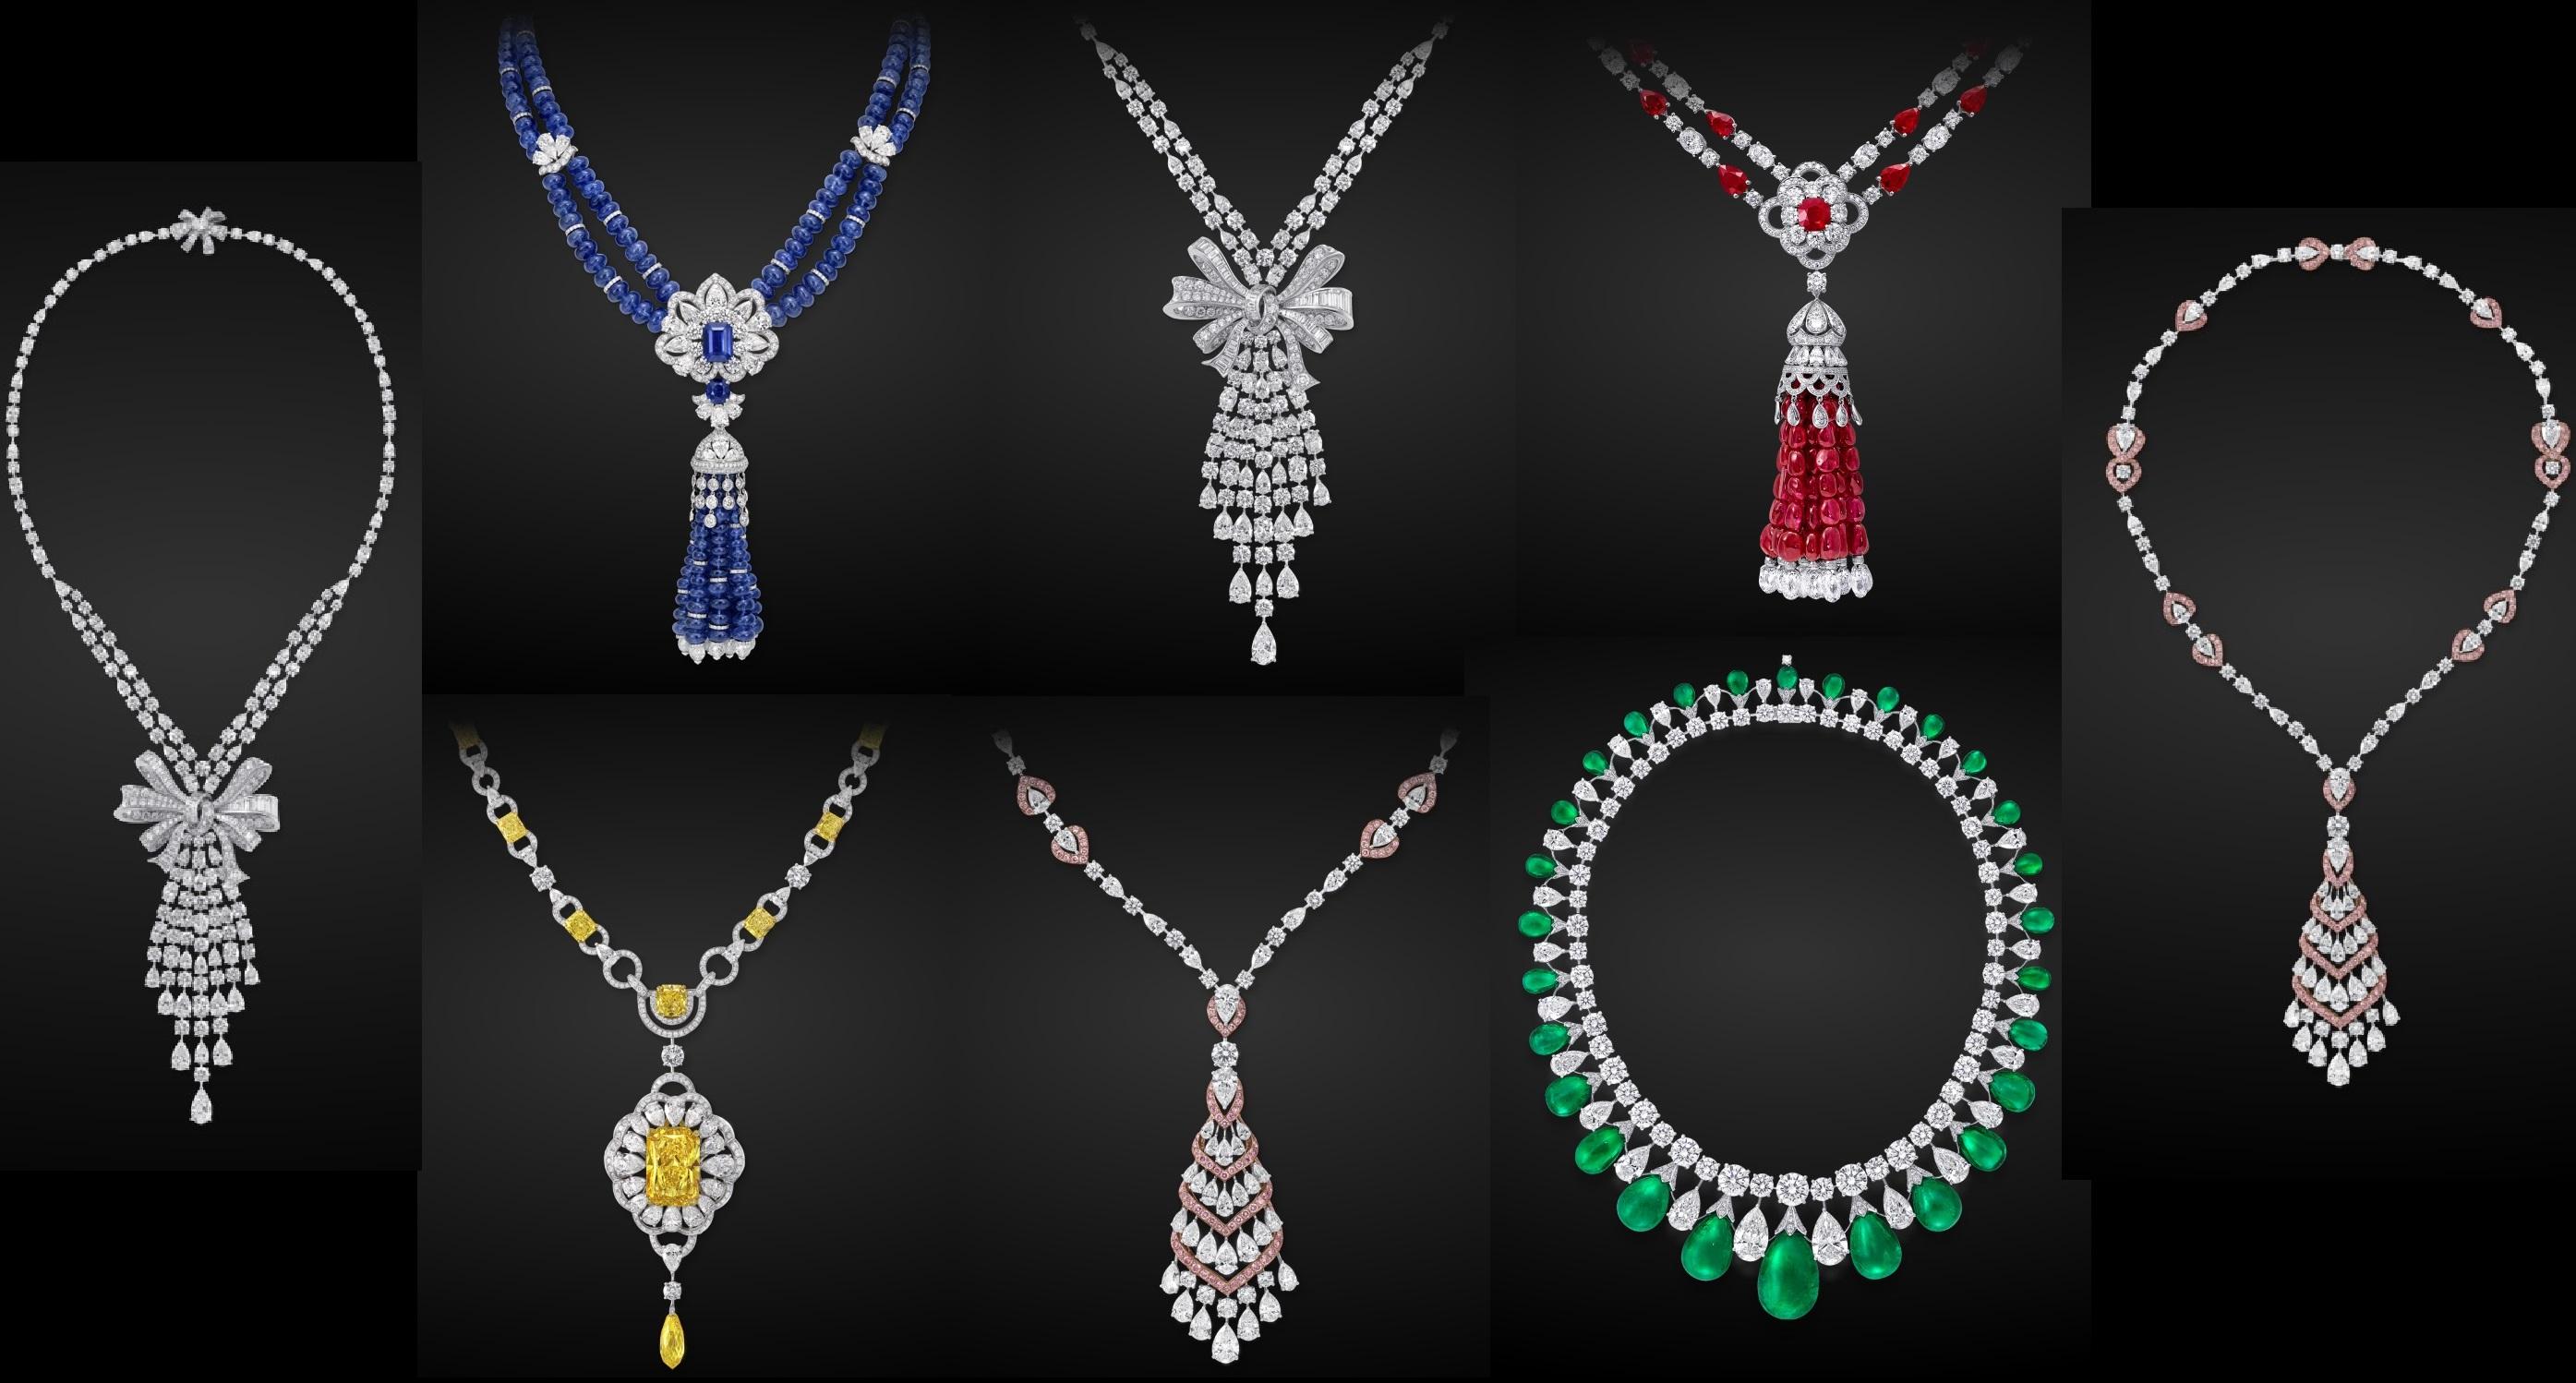 Spectacular Gemstone and Diamond Necklaces by Graff Diamonds